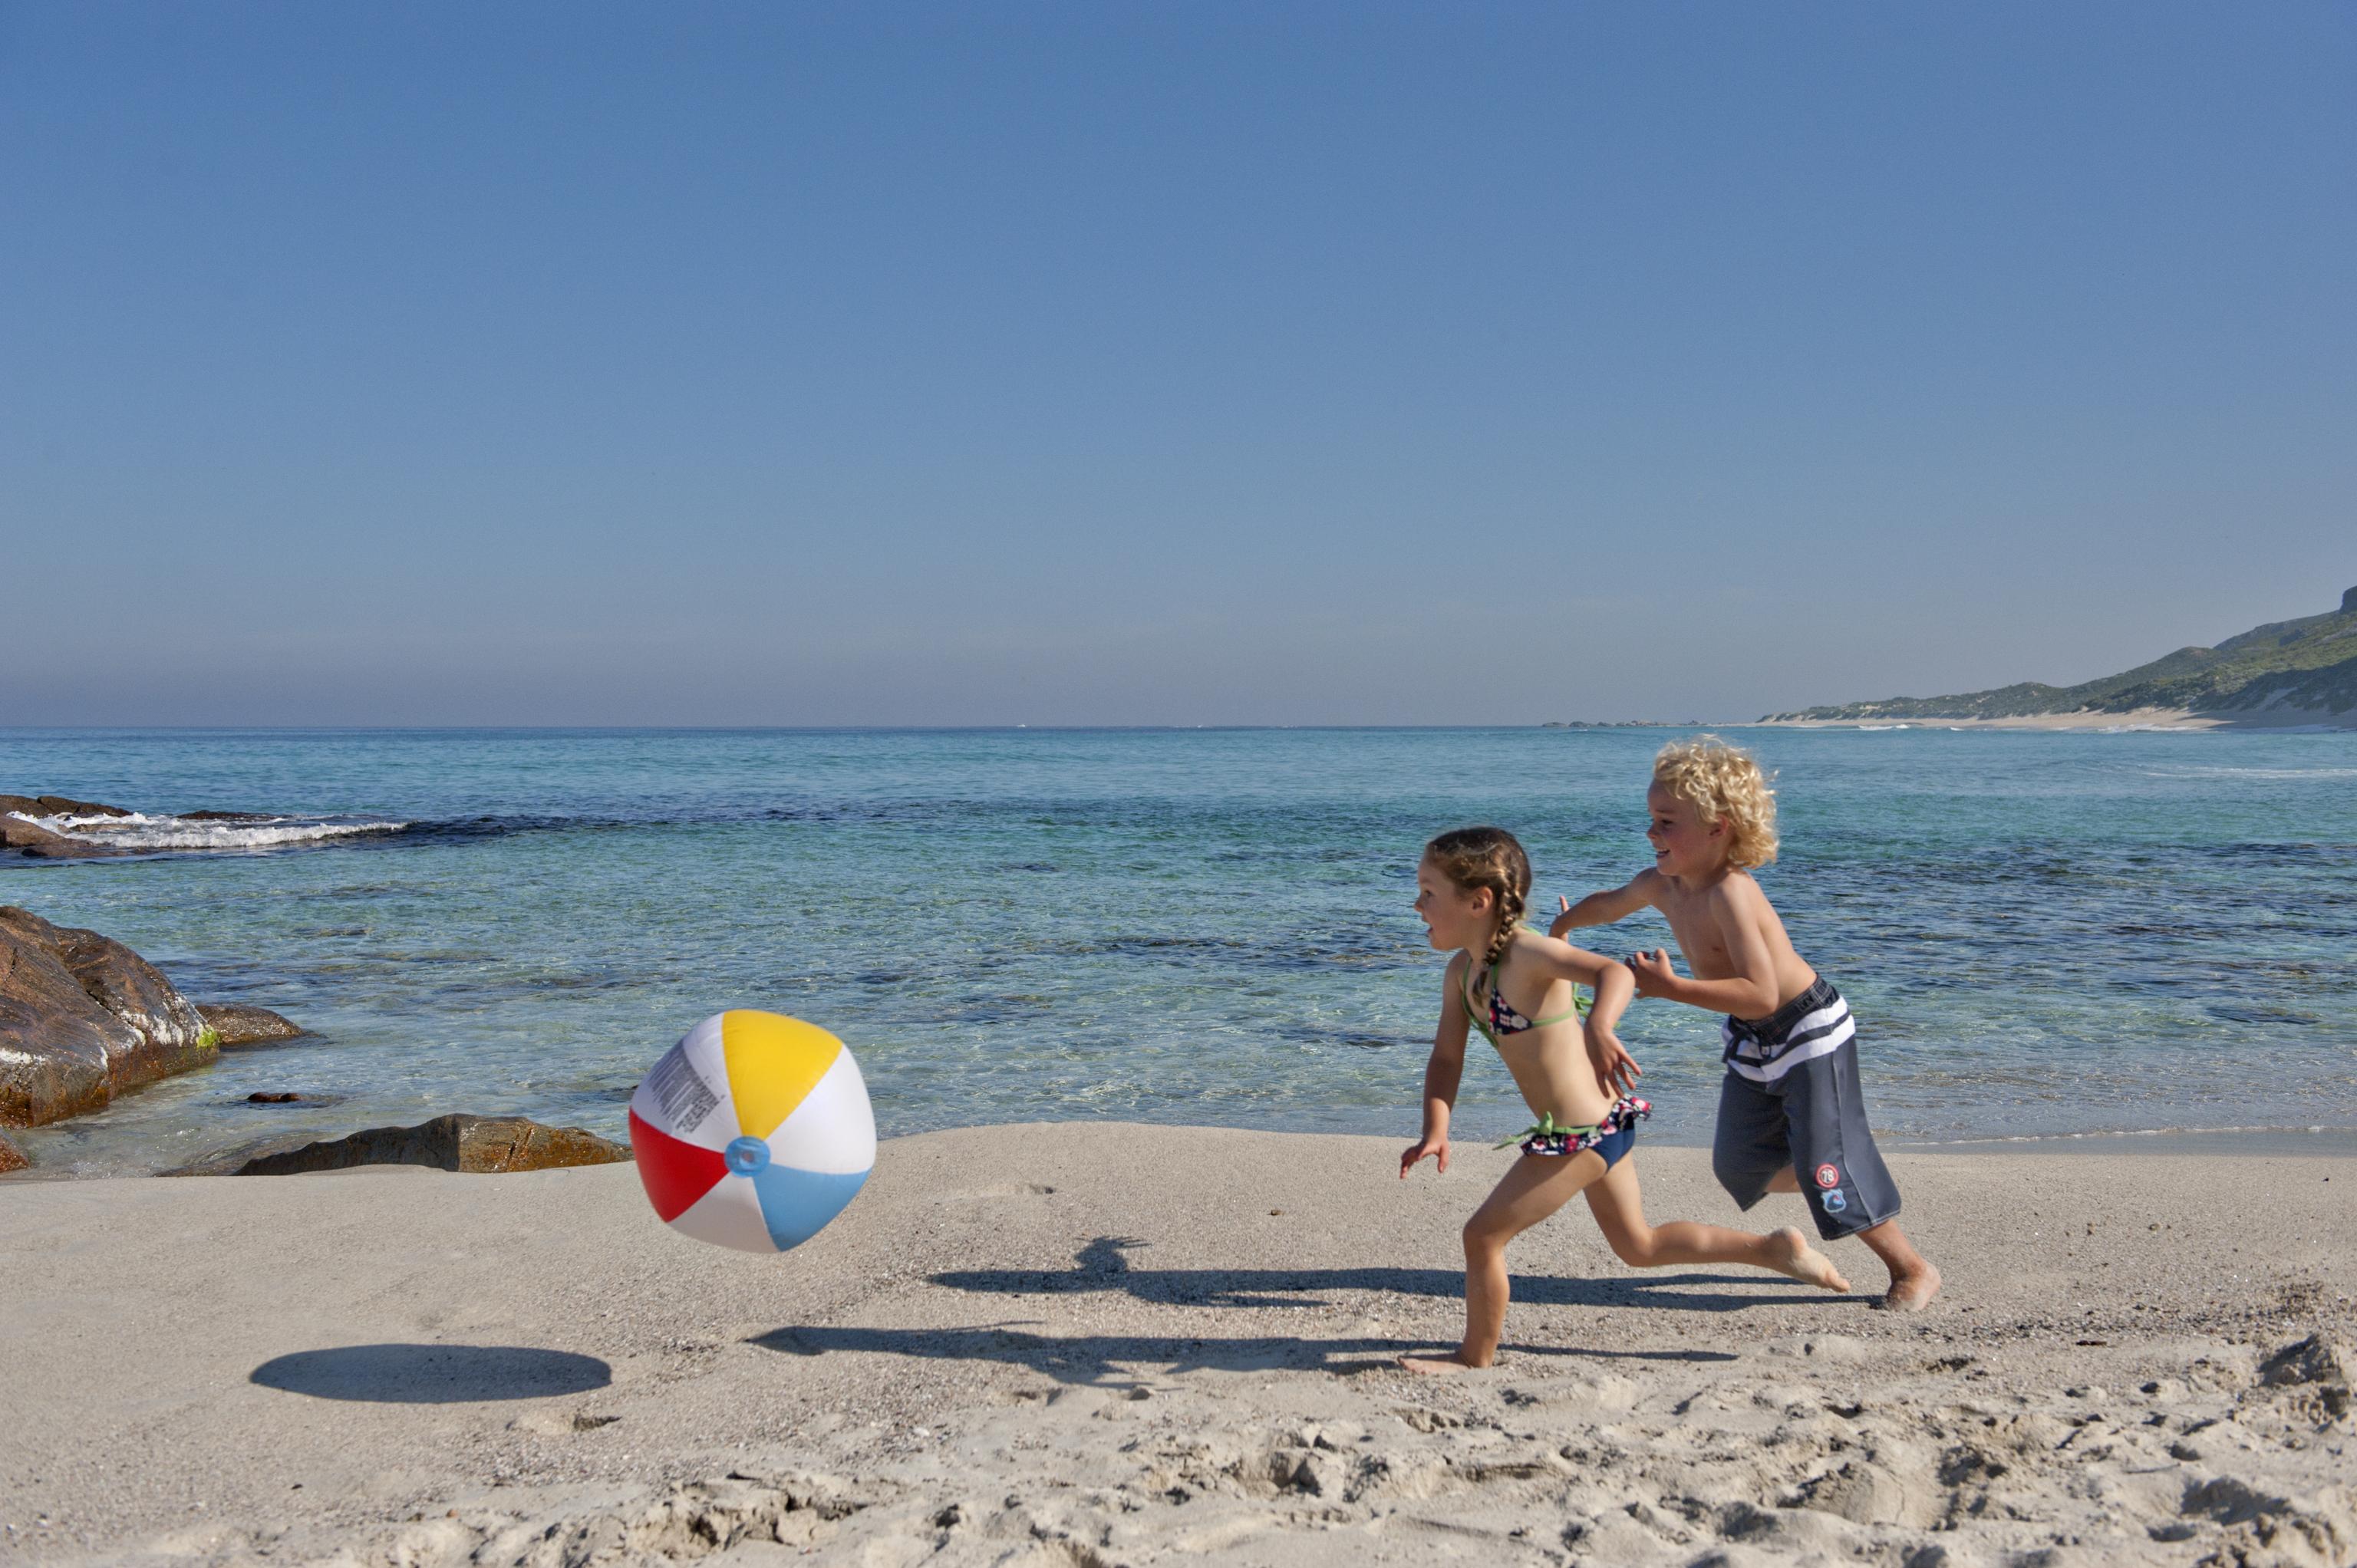 Swim Guide, beach, water quality